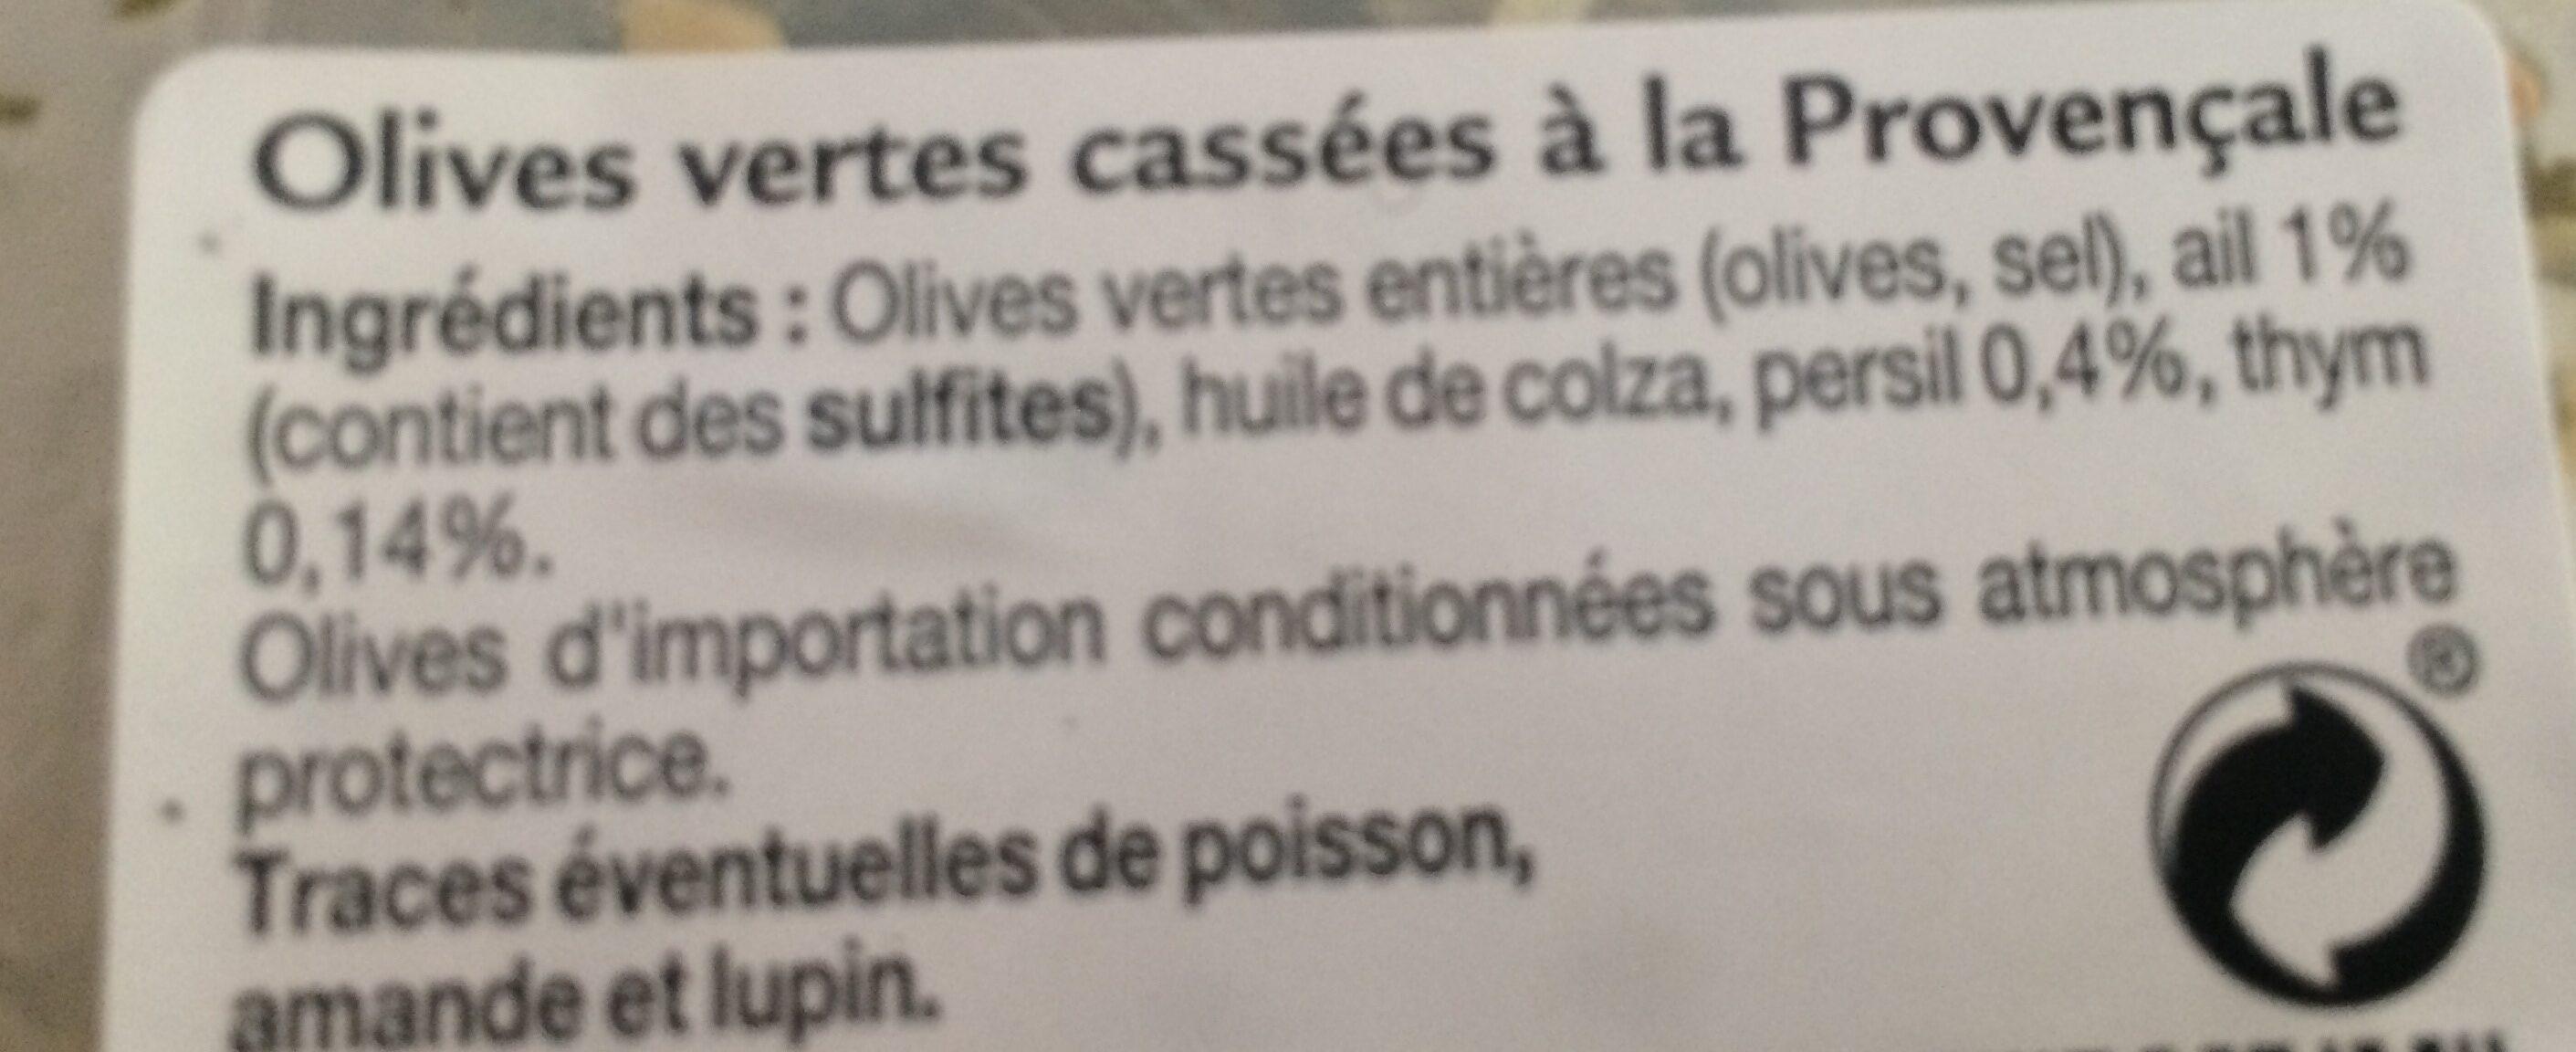 Olives vertes casses a la provençale - Ingrédients